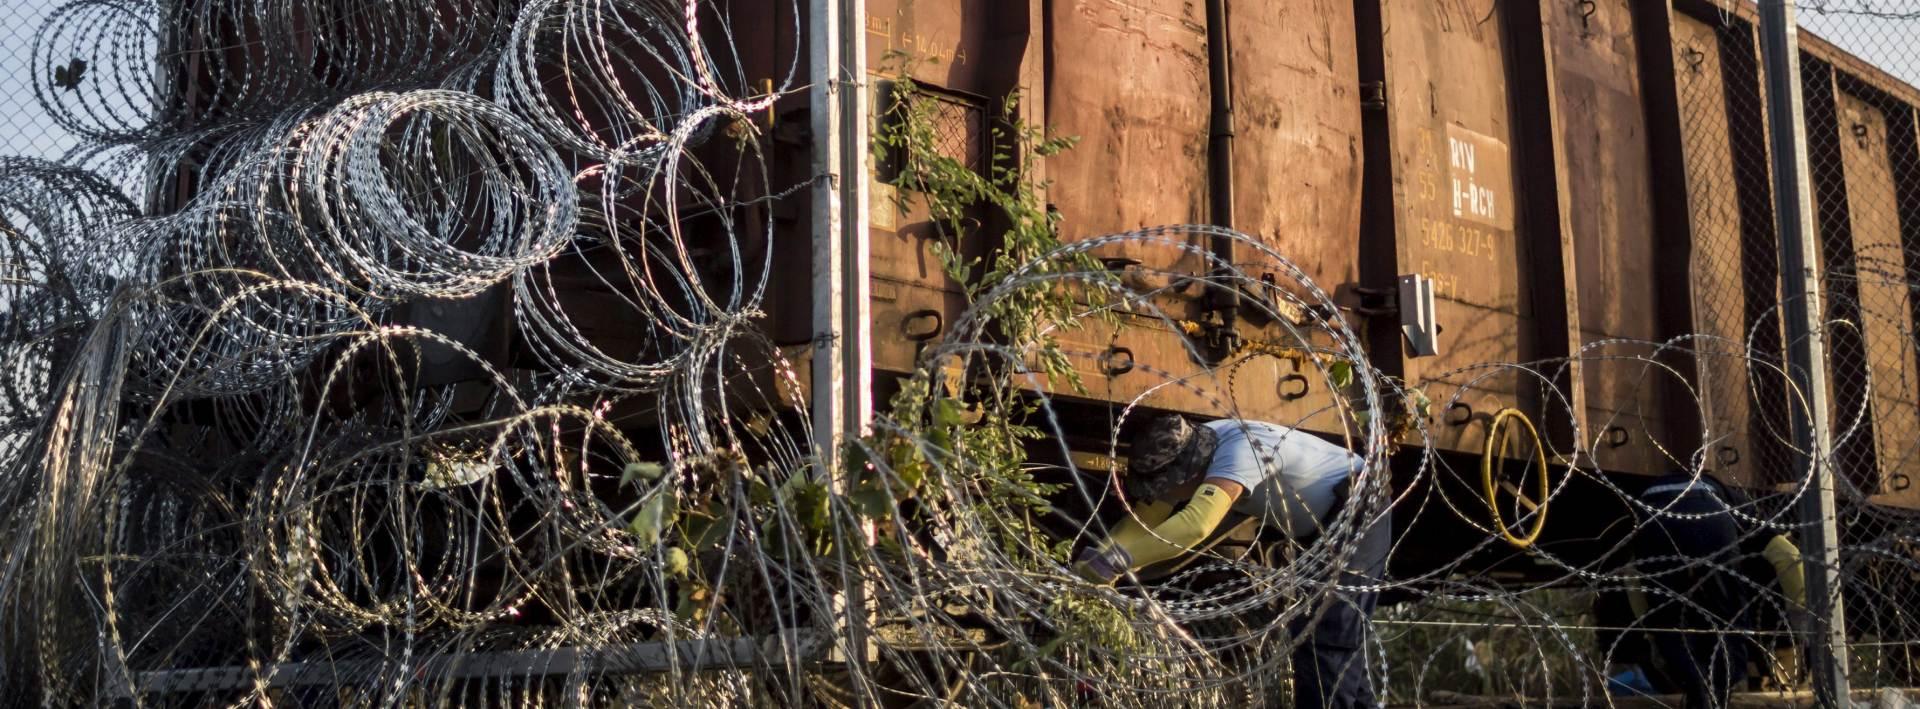 MAĐARSKI EUROZASTUPNIK: Svinjske glave na ogradi zastrašit će migrante